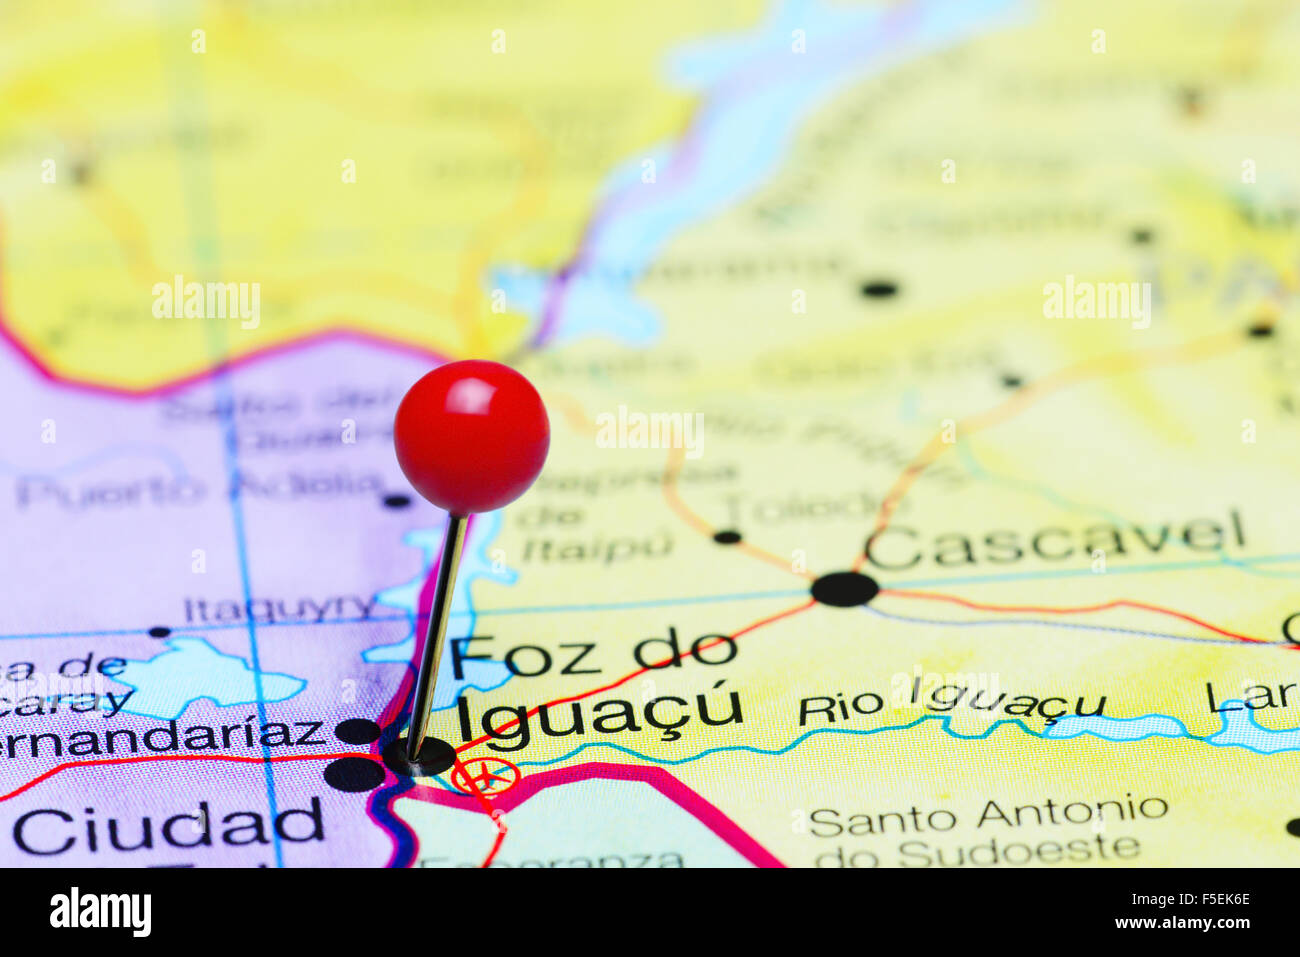 Foz do Iguacu pinned on a map of Brazil Stock Photo Royalty Free